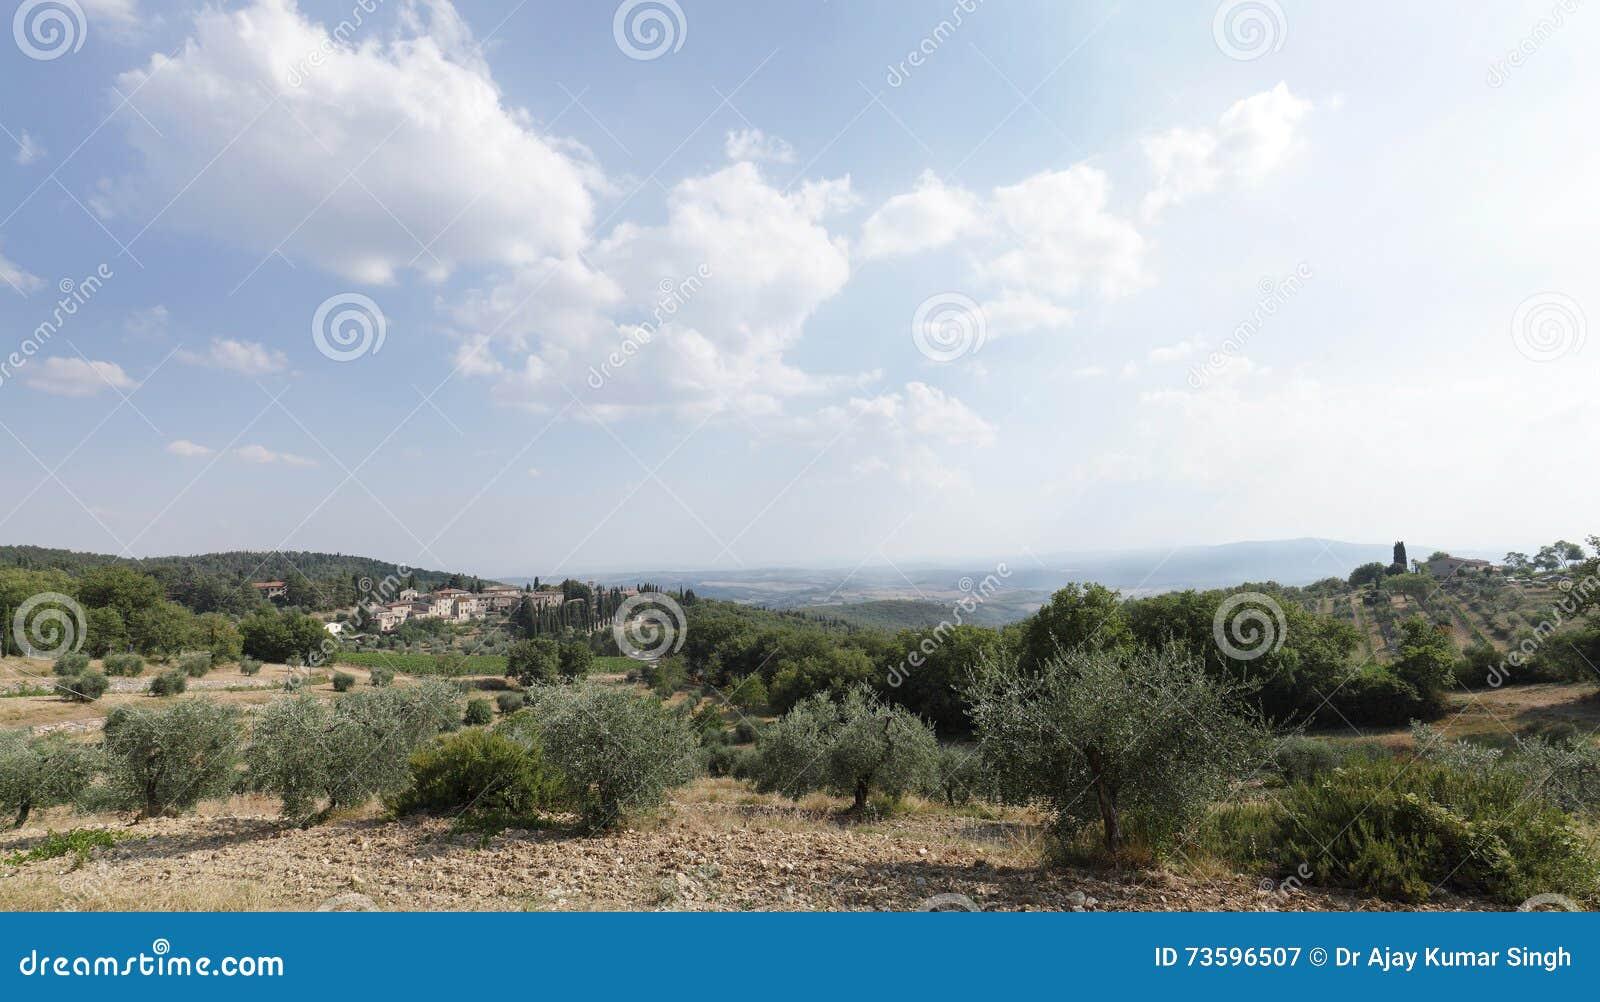 Castellina in Chianti on hill, Tuscany